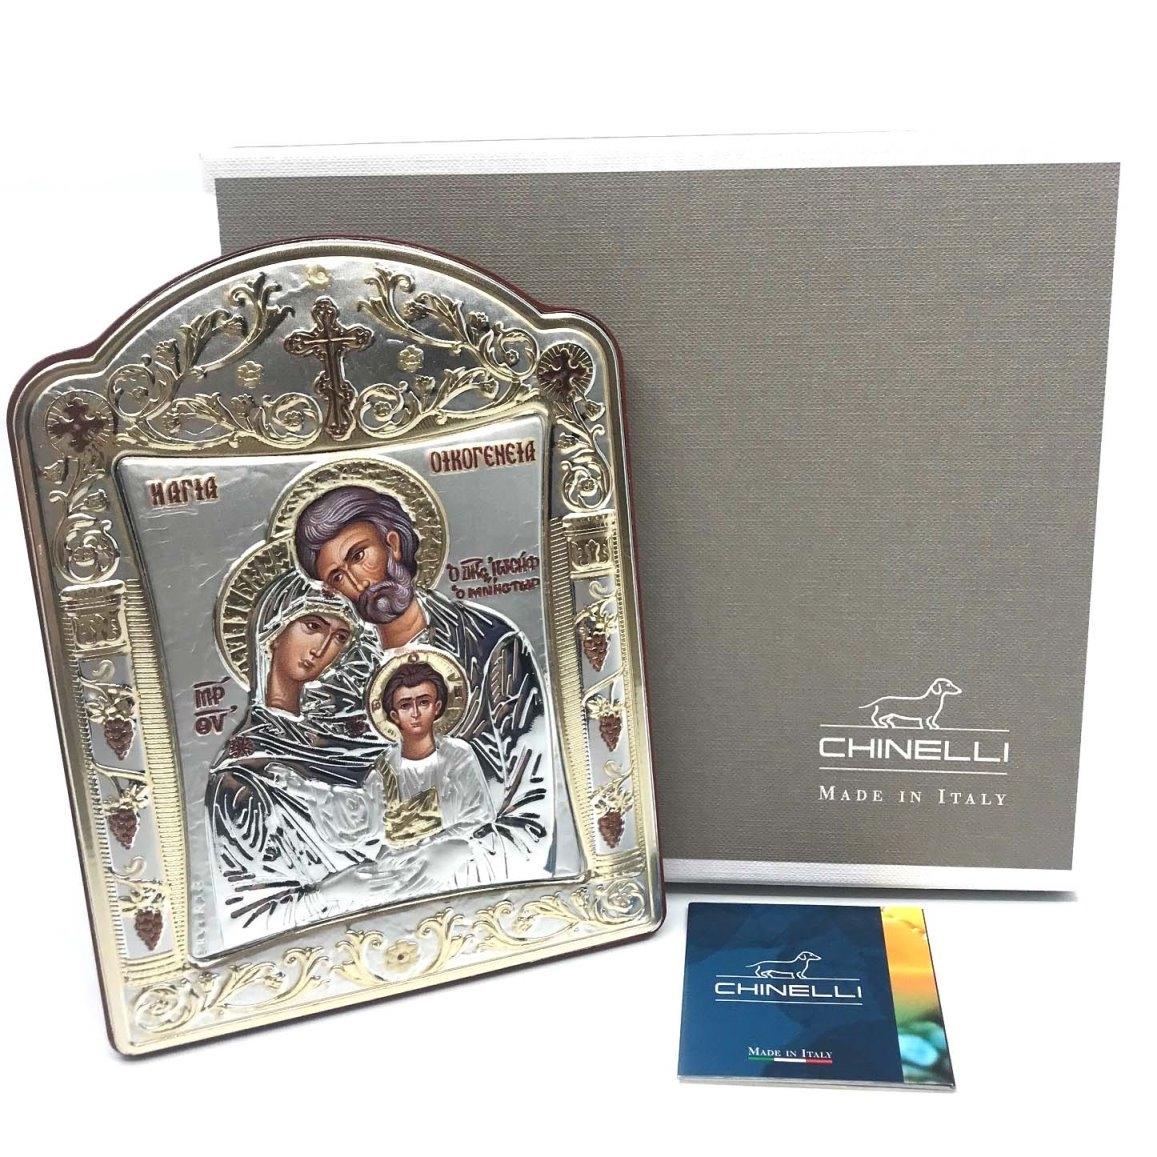 Icoana Sagrada Famiglia placata Aur si Argint by Chinelli   made in Italy